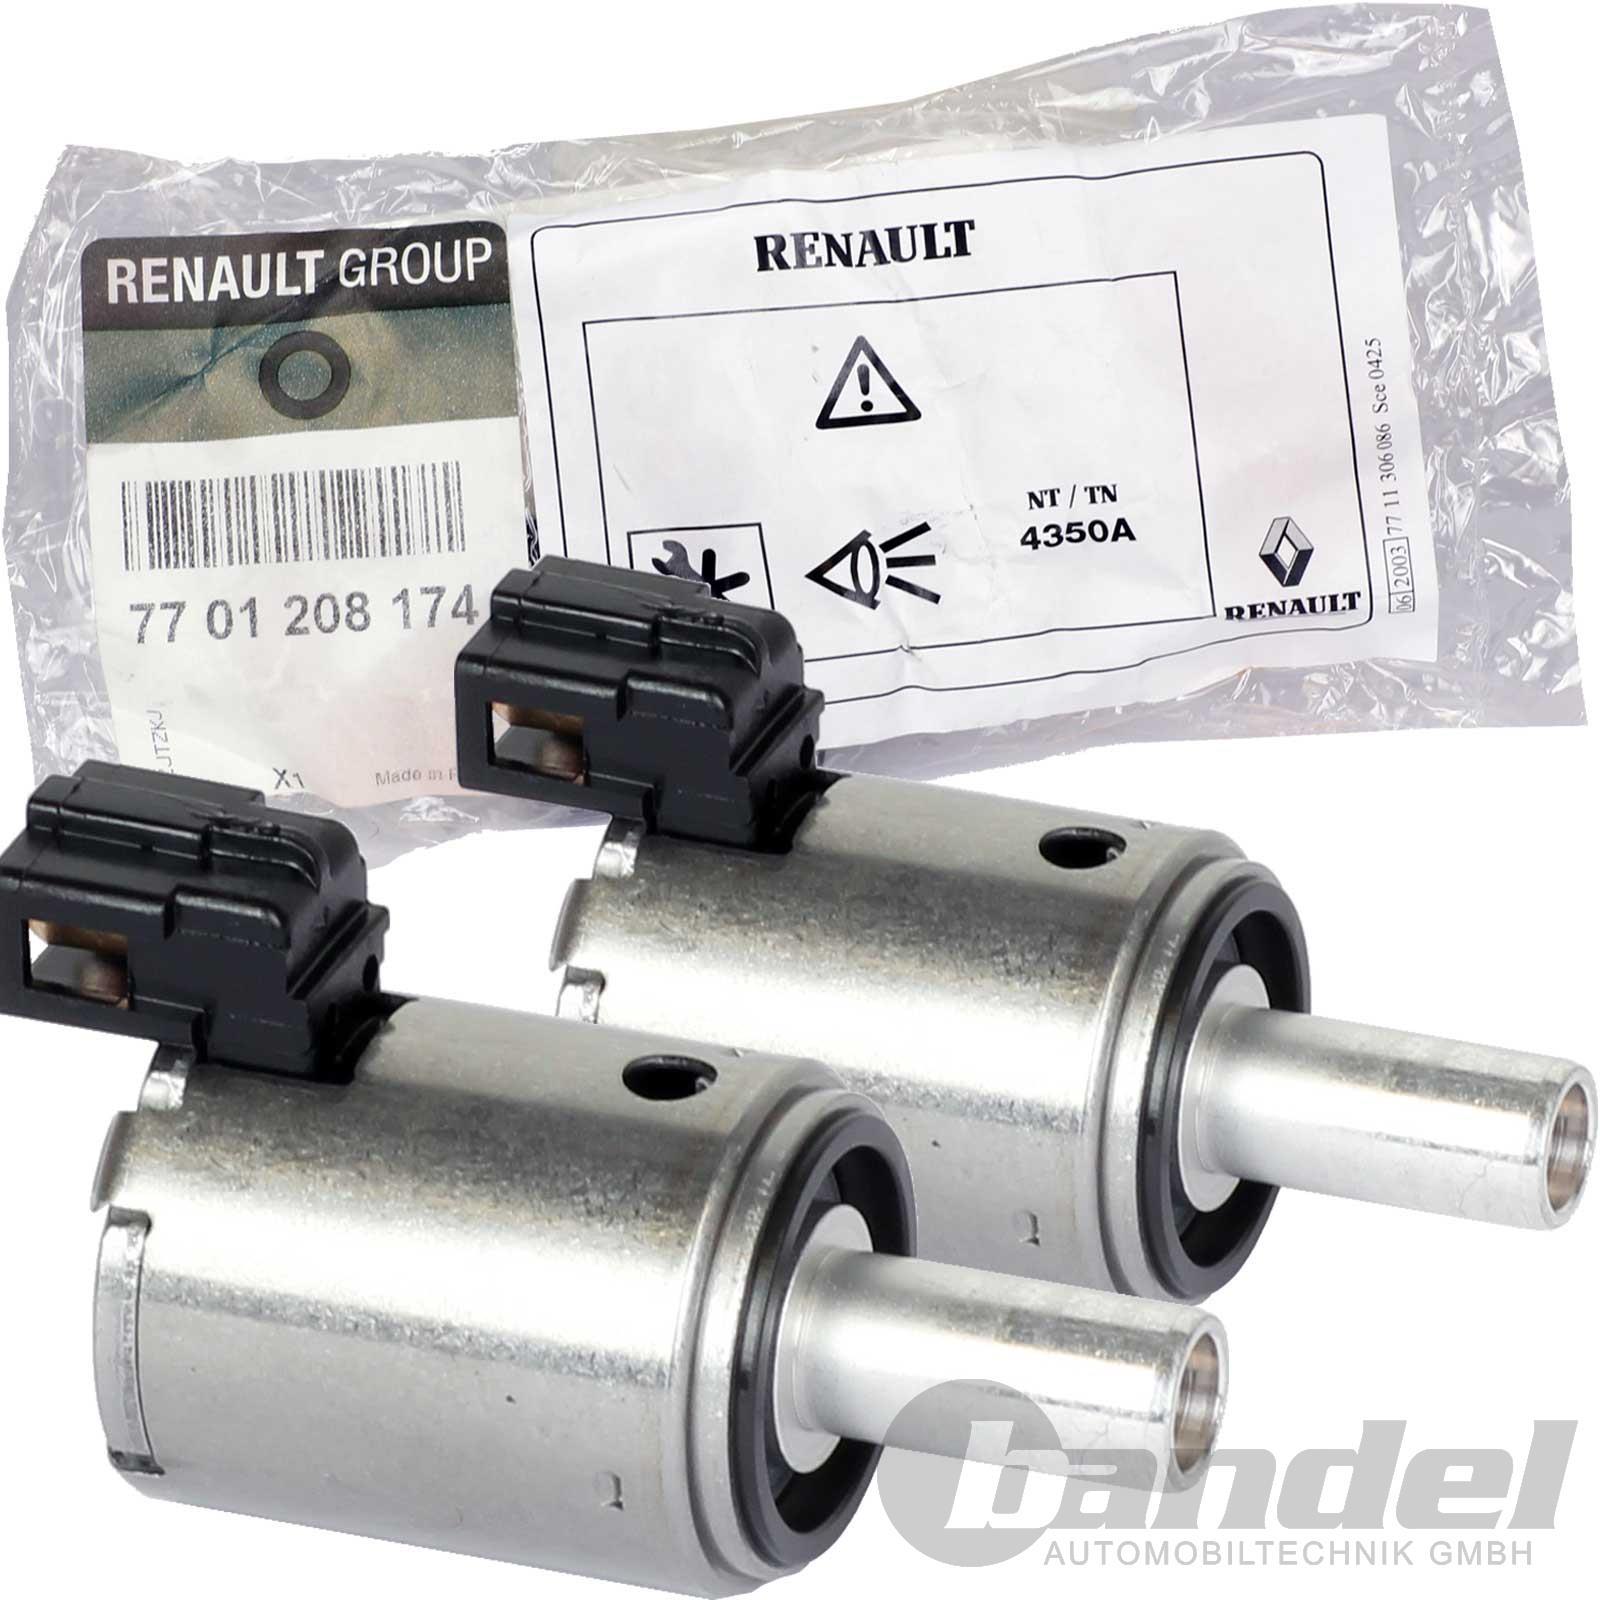 ORIGINAL Renault Getriebeventil Schaltventil Automatikgetriebe 7701208174